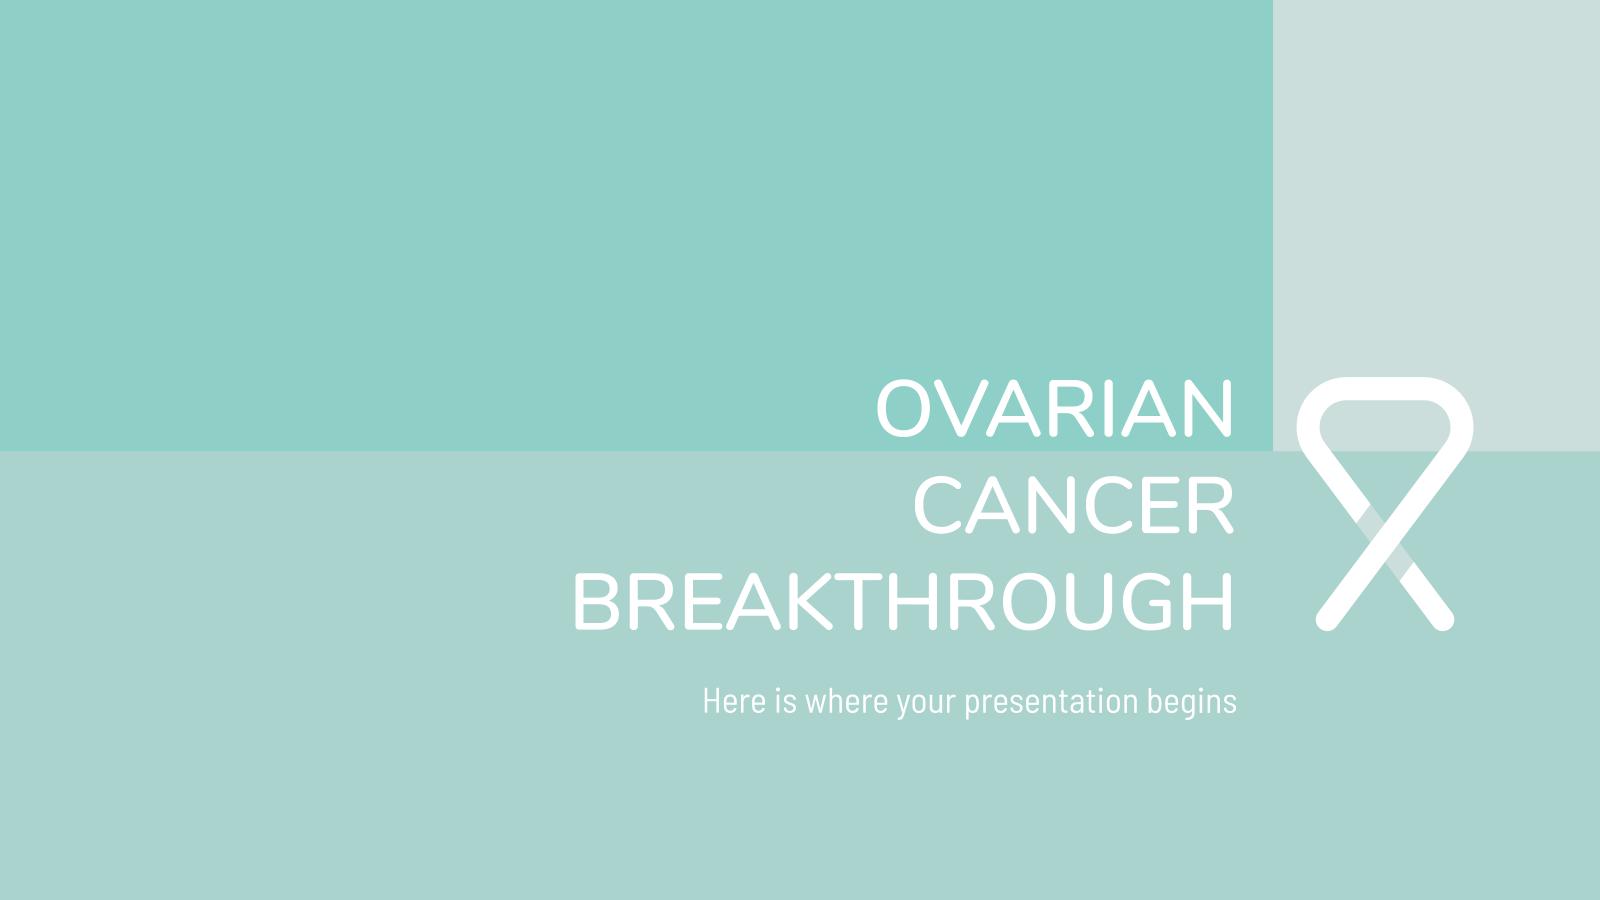 Ovarian Cancer Breakthrough Google Slides Ppt Template